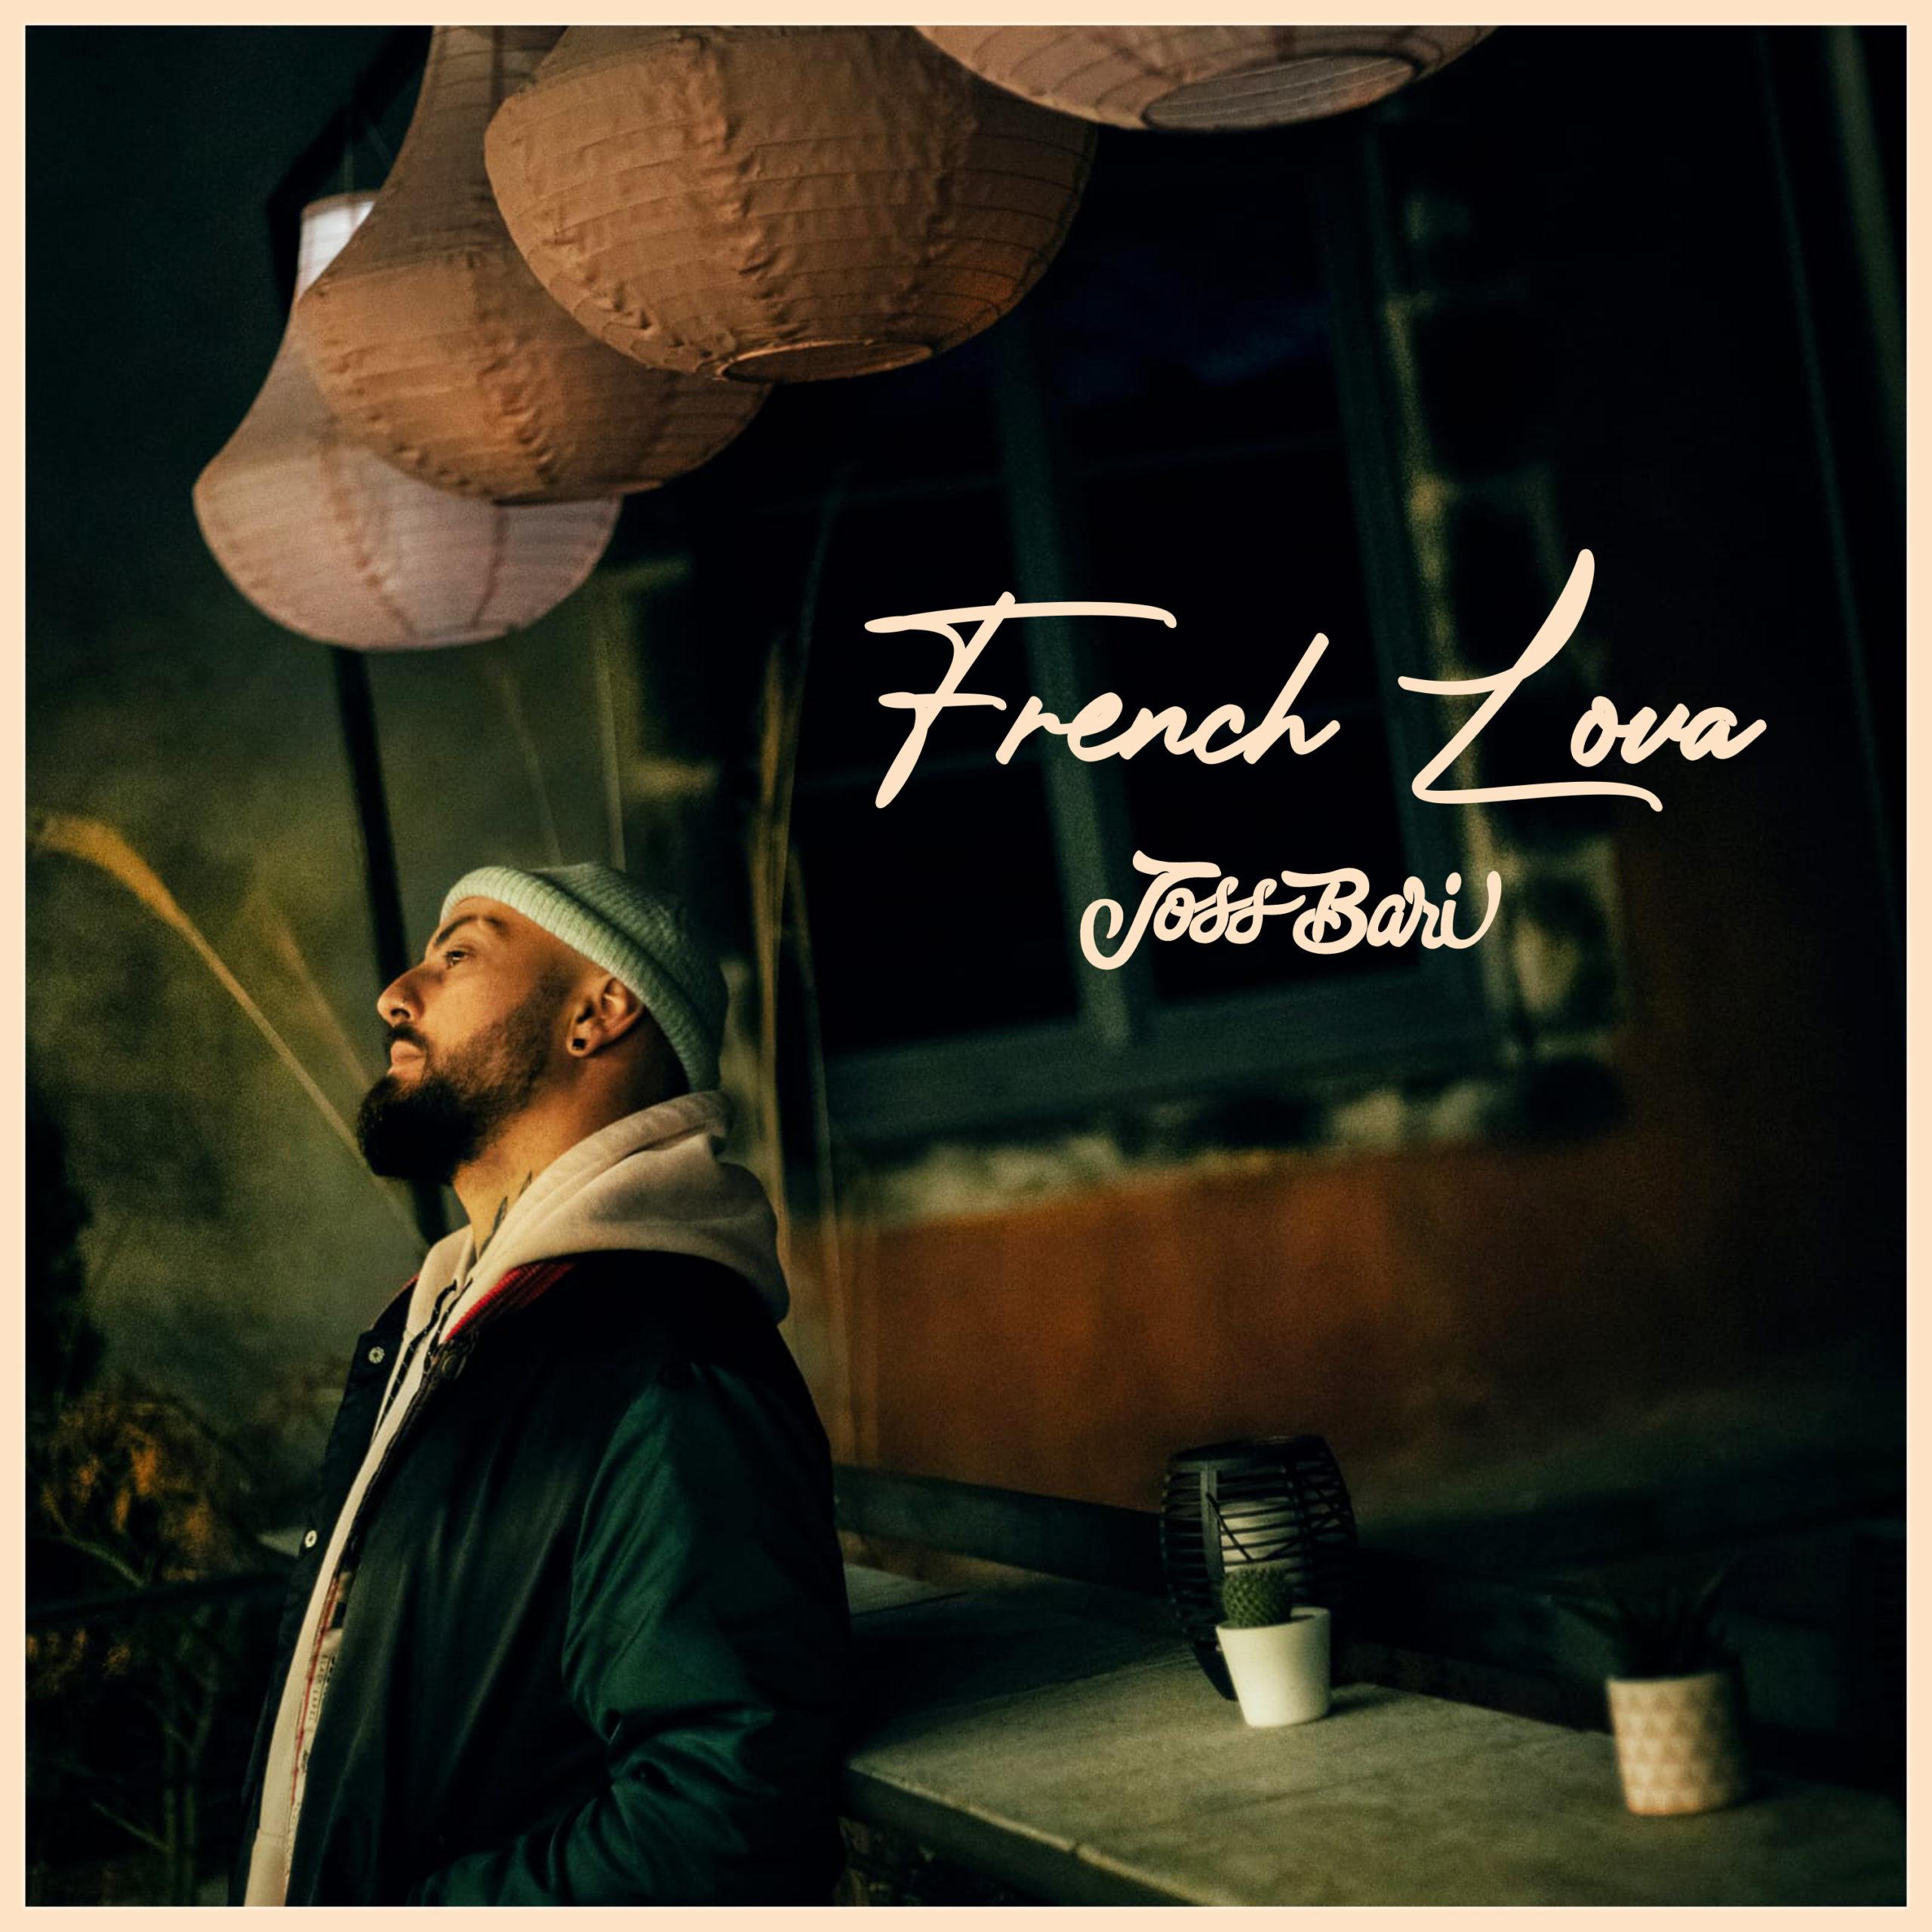 Joss Bari - French Lova (Official Music Video)